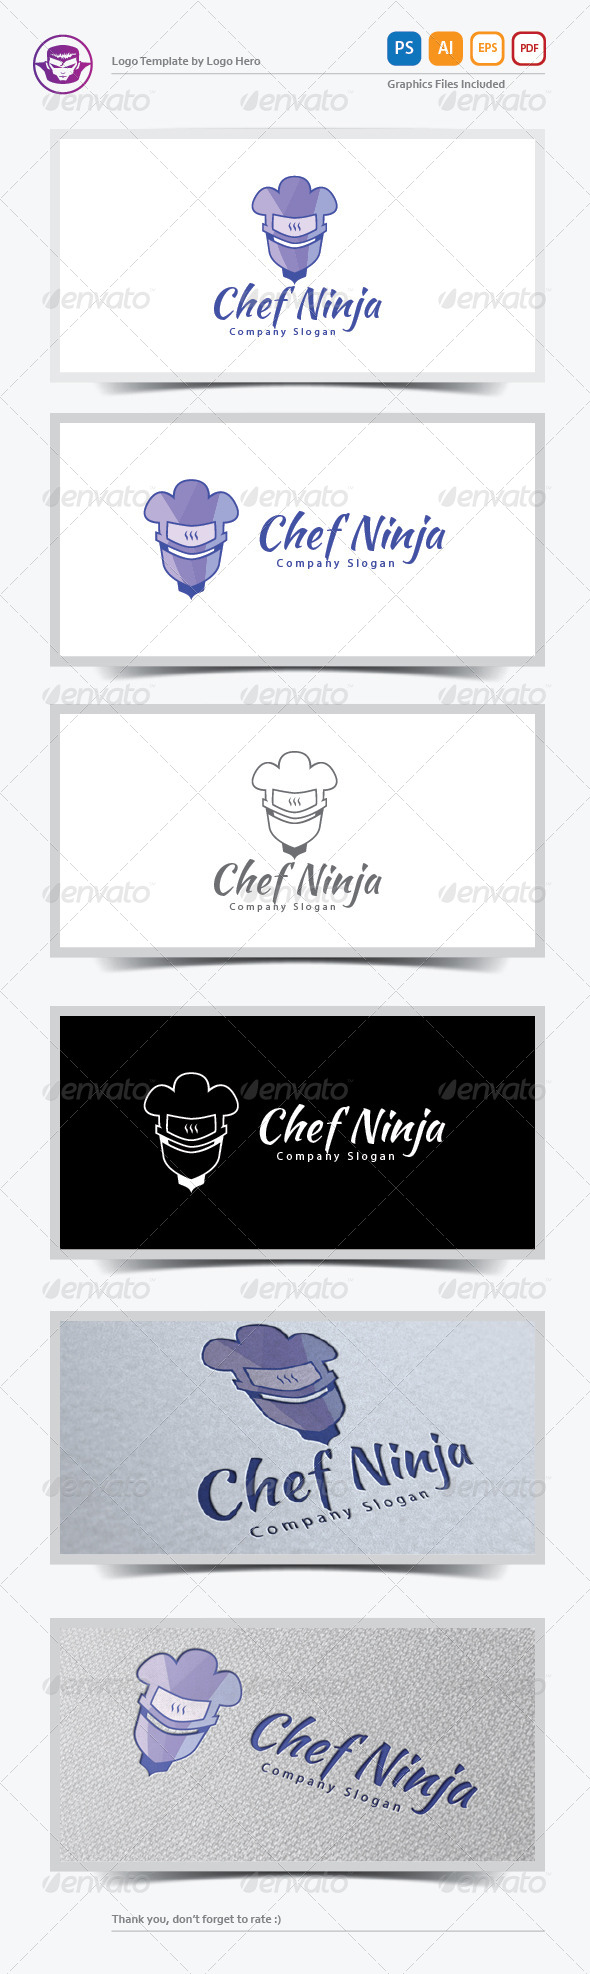 GraphicRiver Chef Ninja Logo Template 6115075